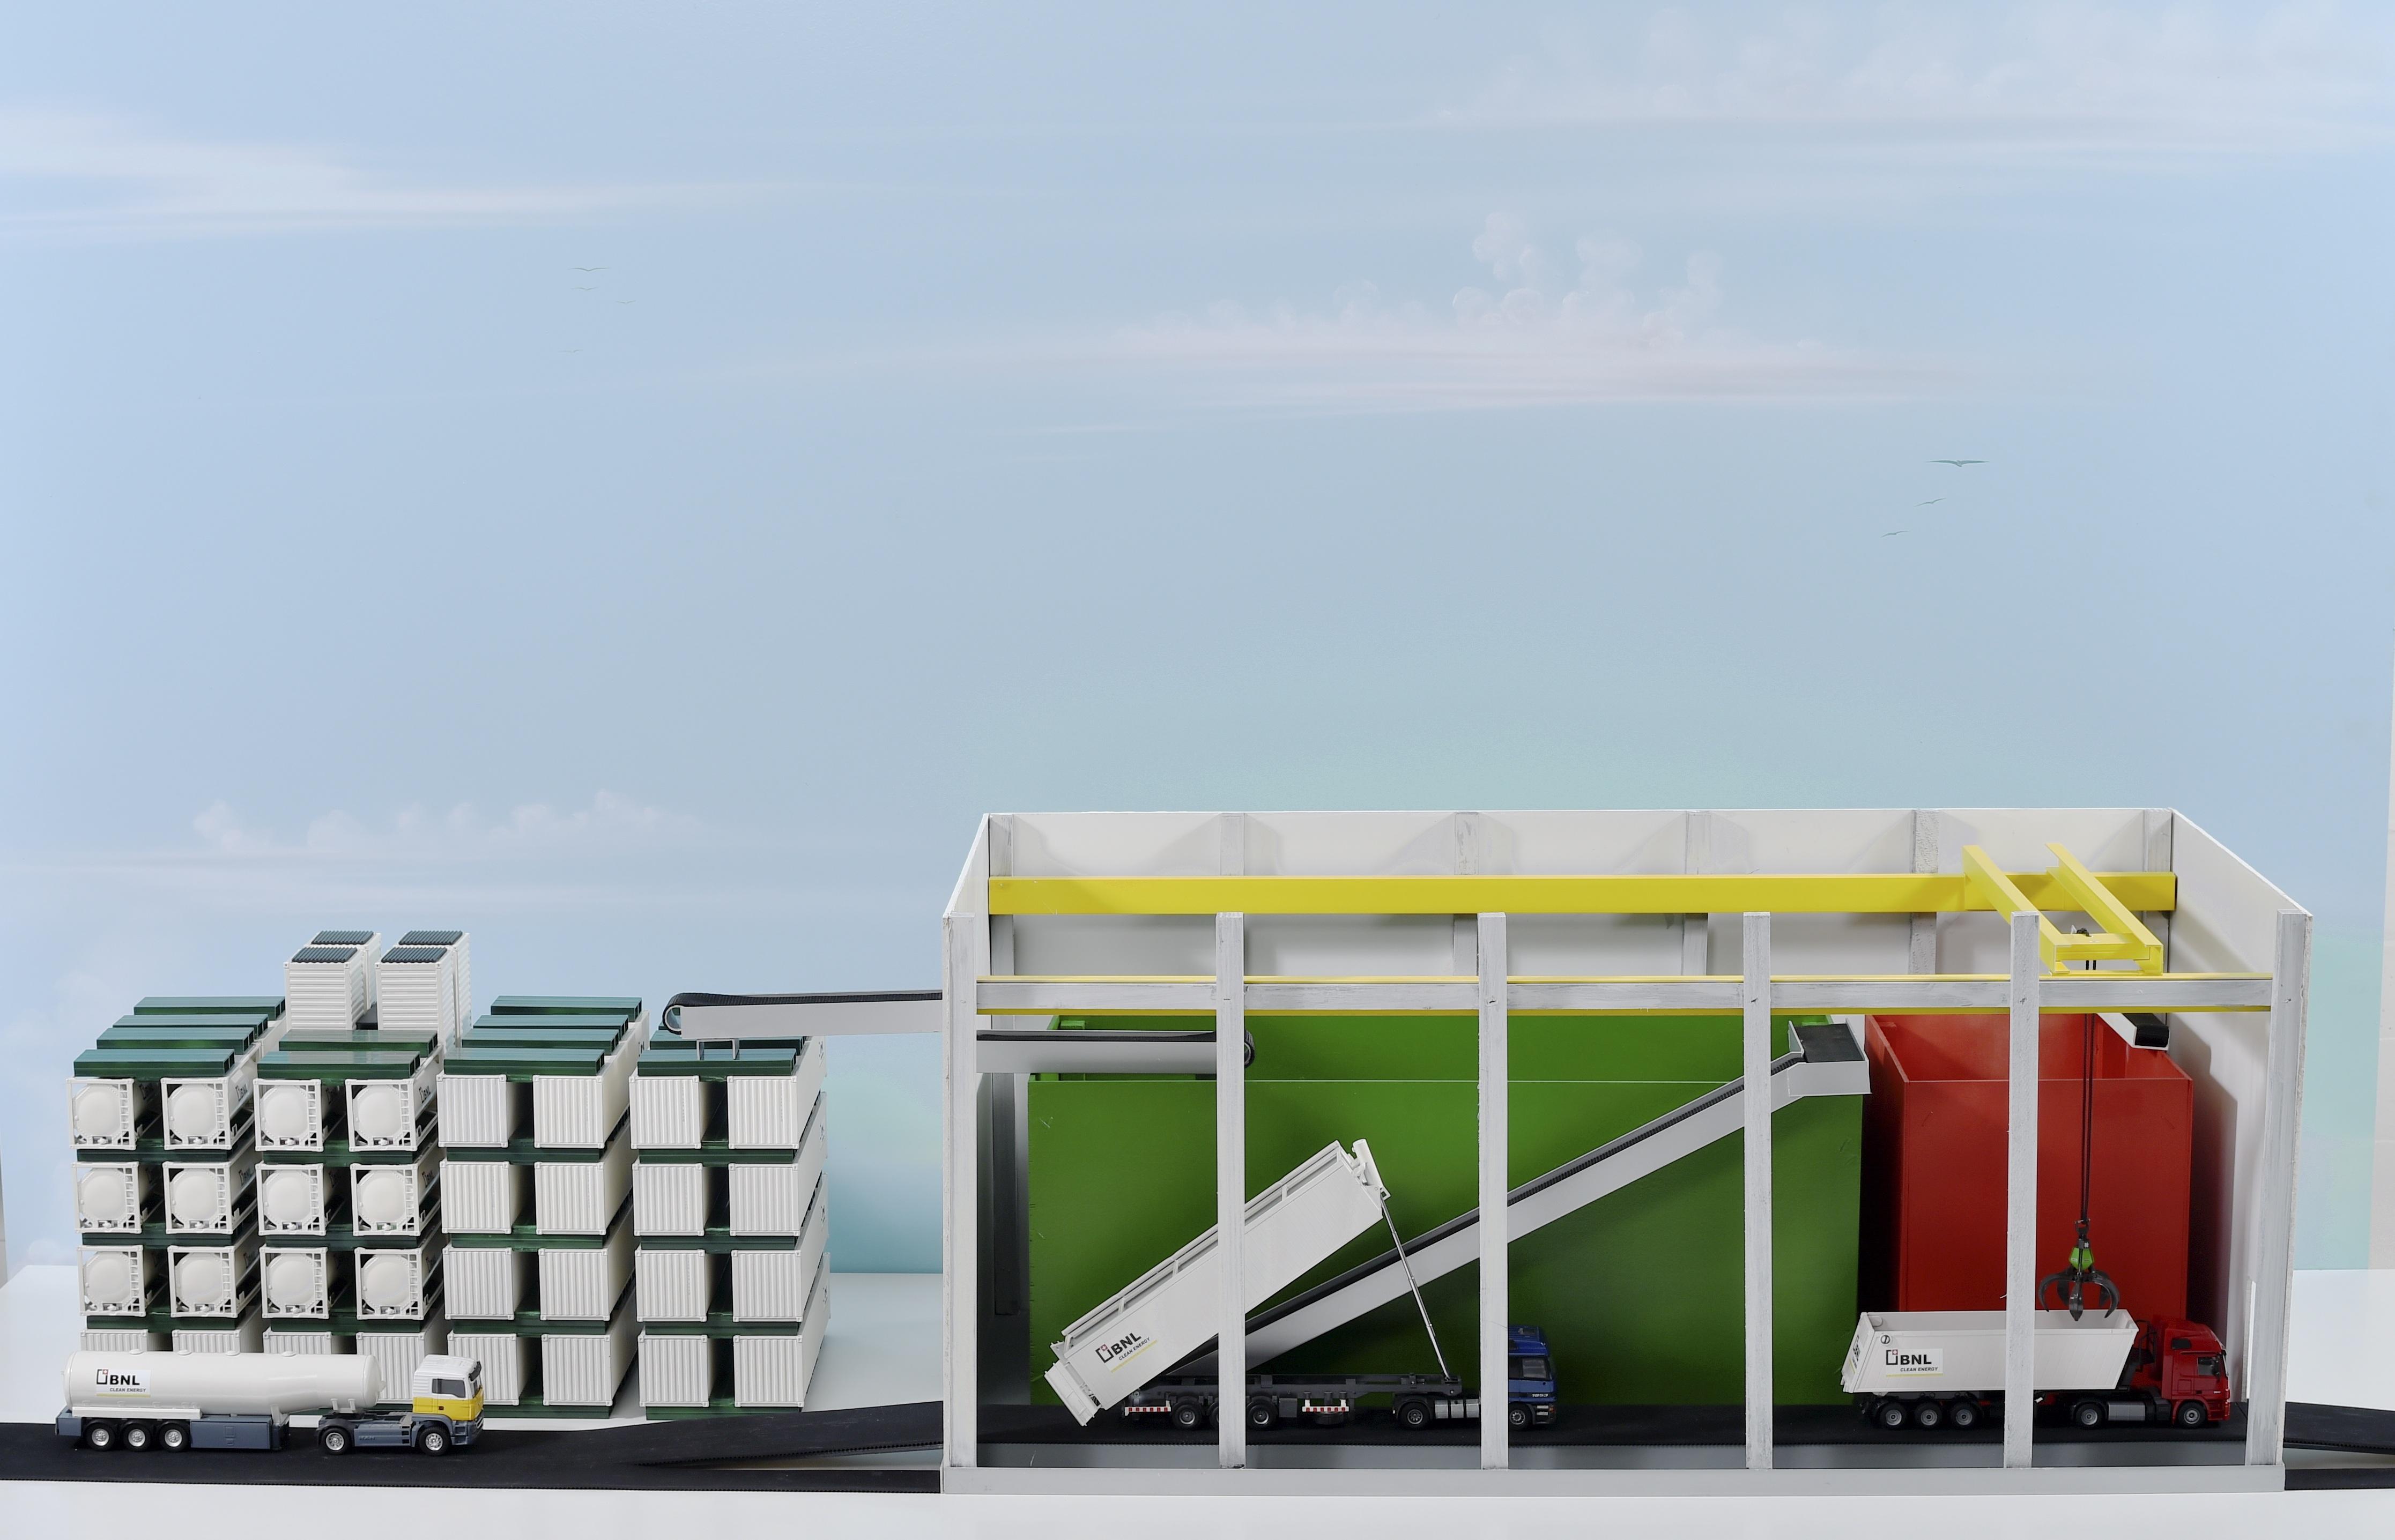 produit nettoyage facade stunning cheap nettoyage facade maison with nettoyage facade maison. Black Bedroom Furniture Sets. Home Design Ideas